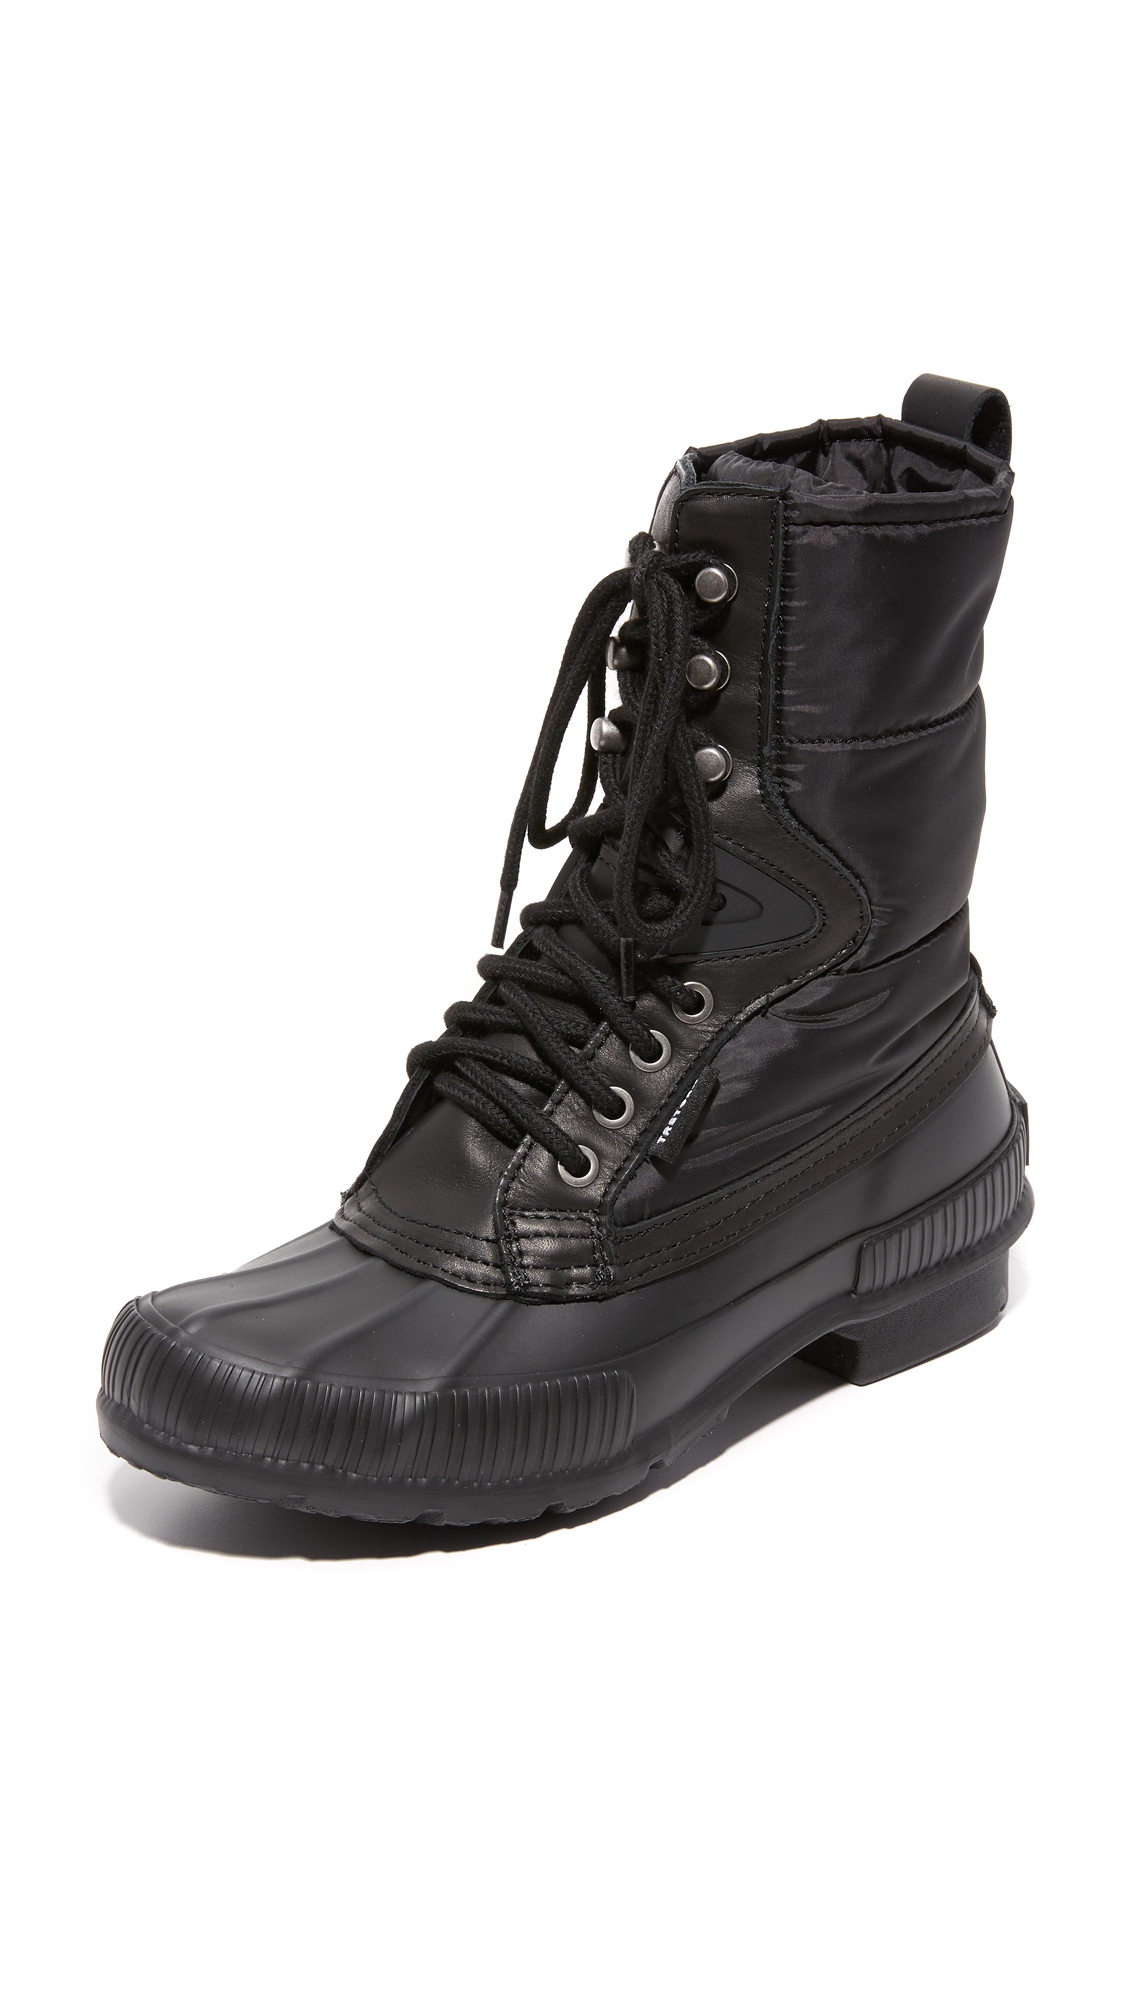 Tretorn Wt Foley Boots - Black